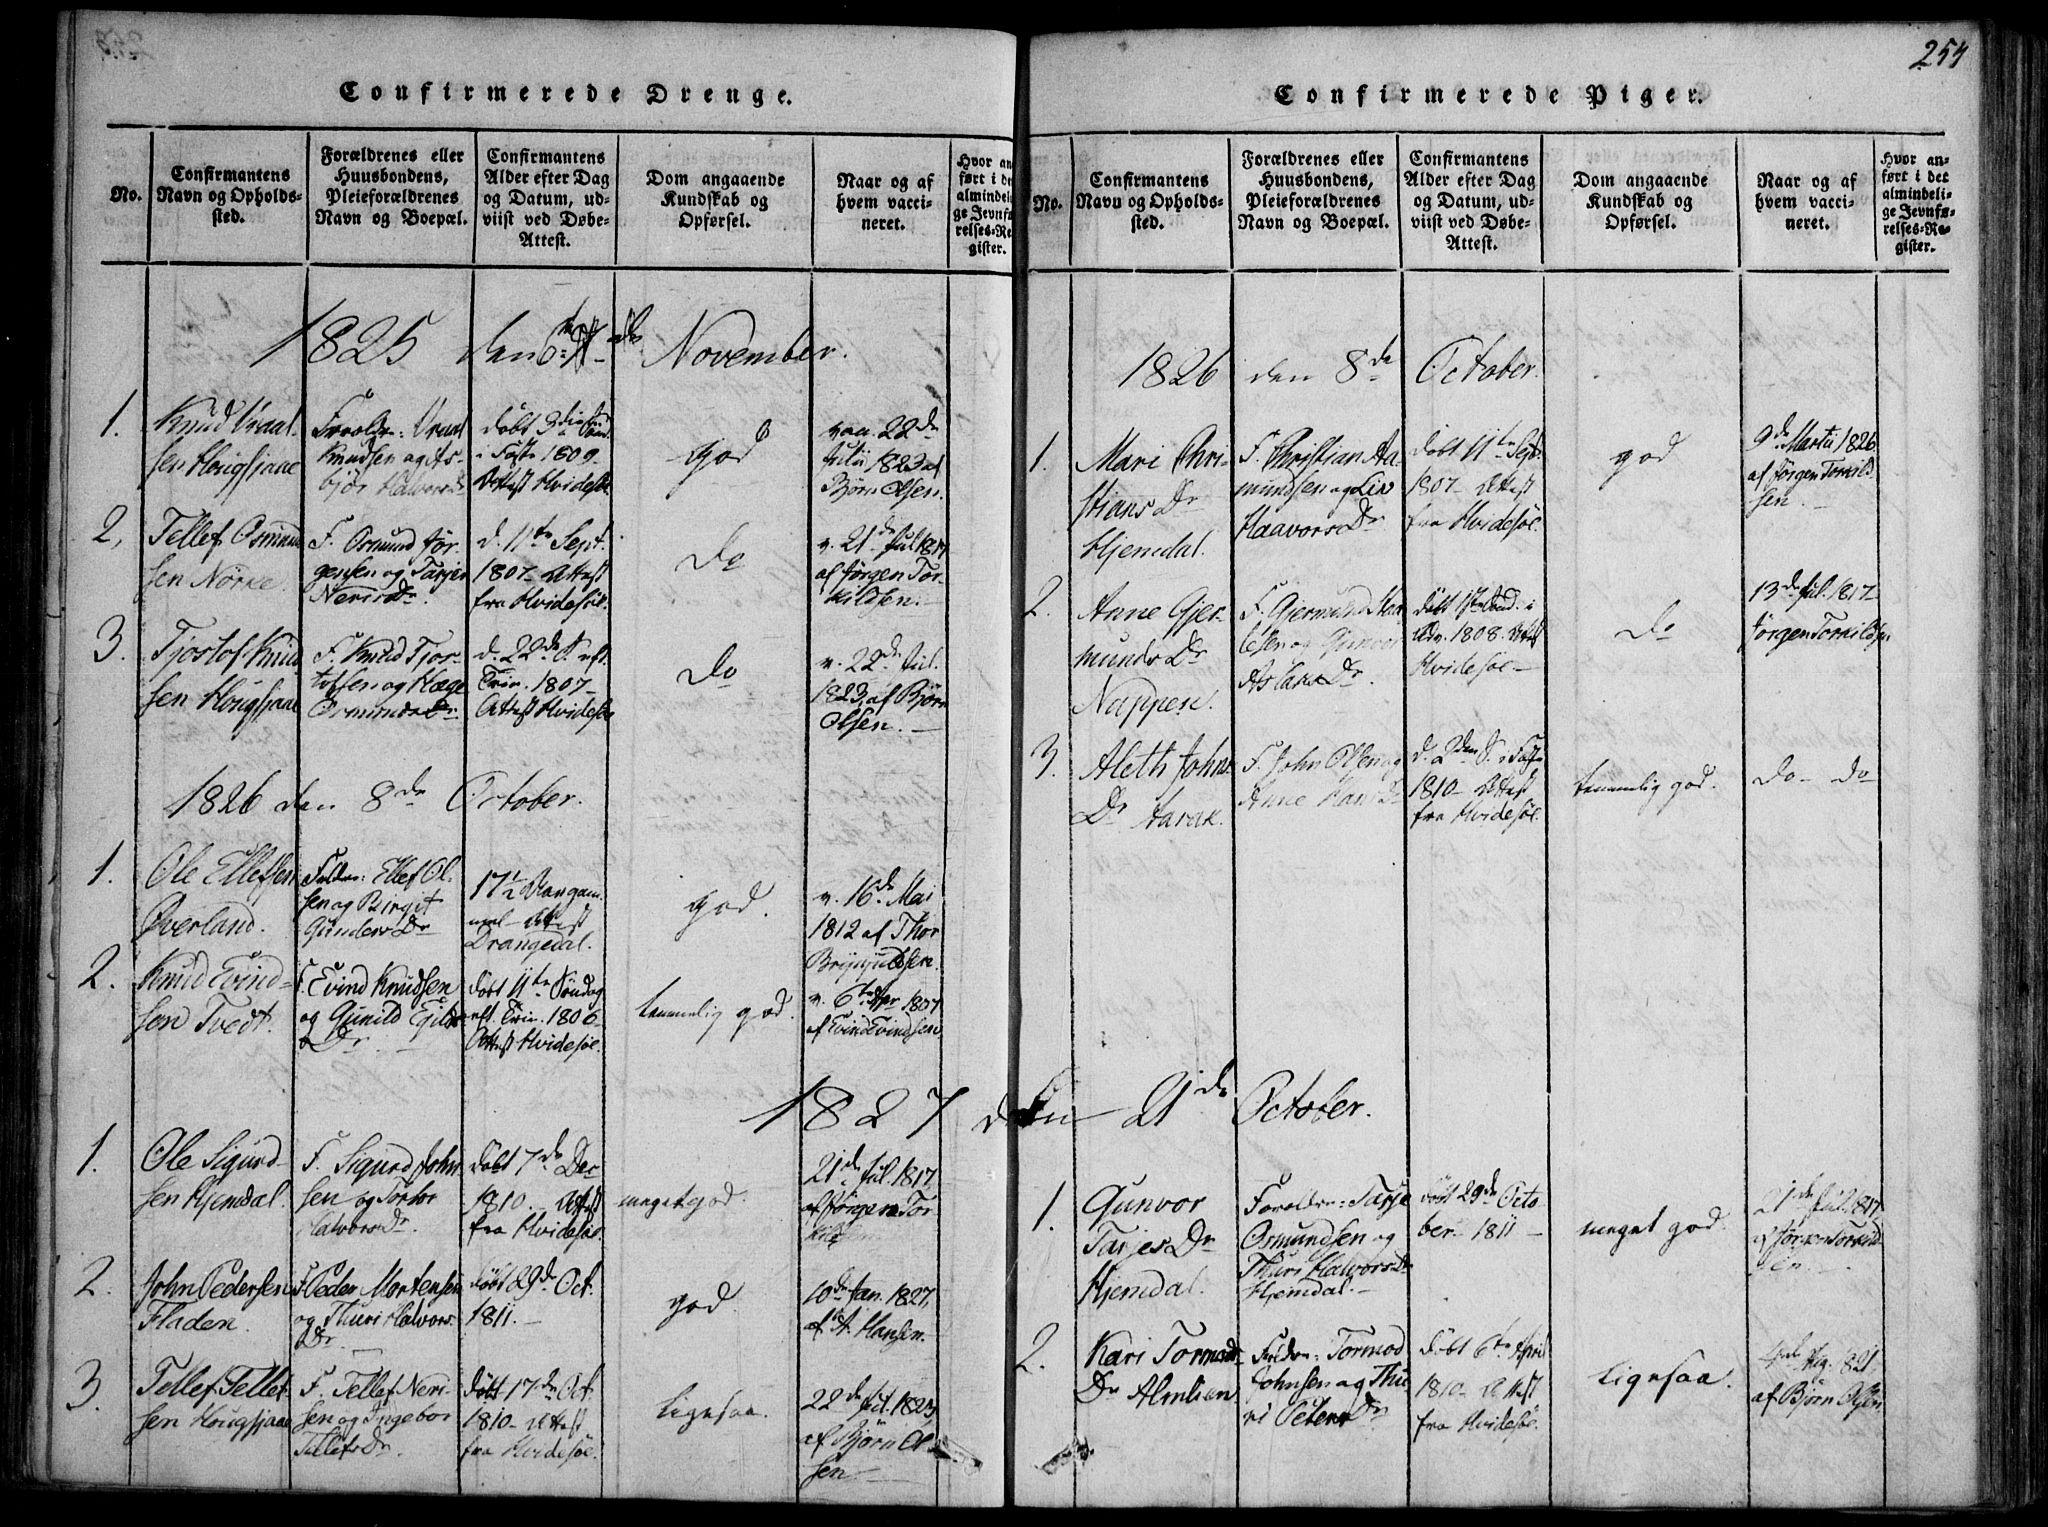 SAKO, Nissedal kirkebøker, F/Fb/L0001: Ministerialbok nr. II 1, 1814-1845, s. 254